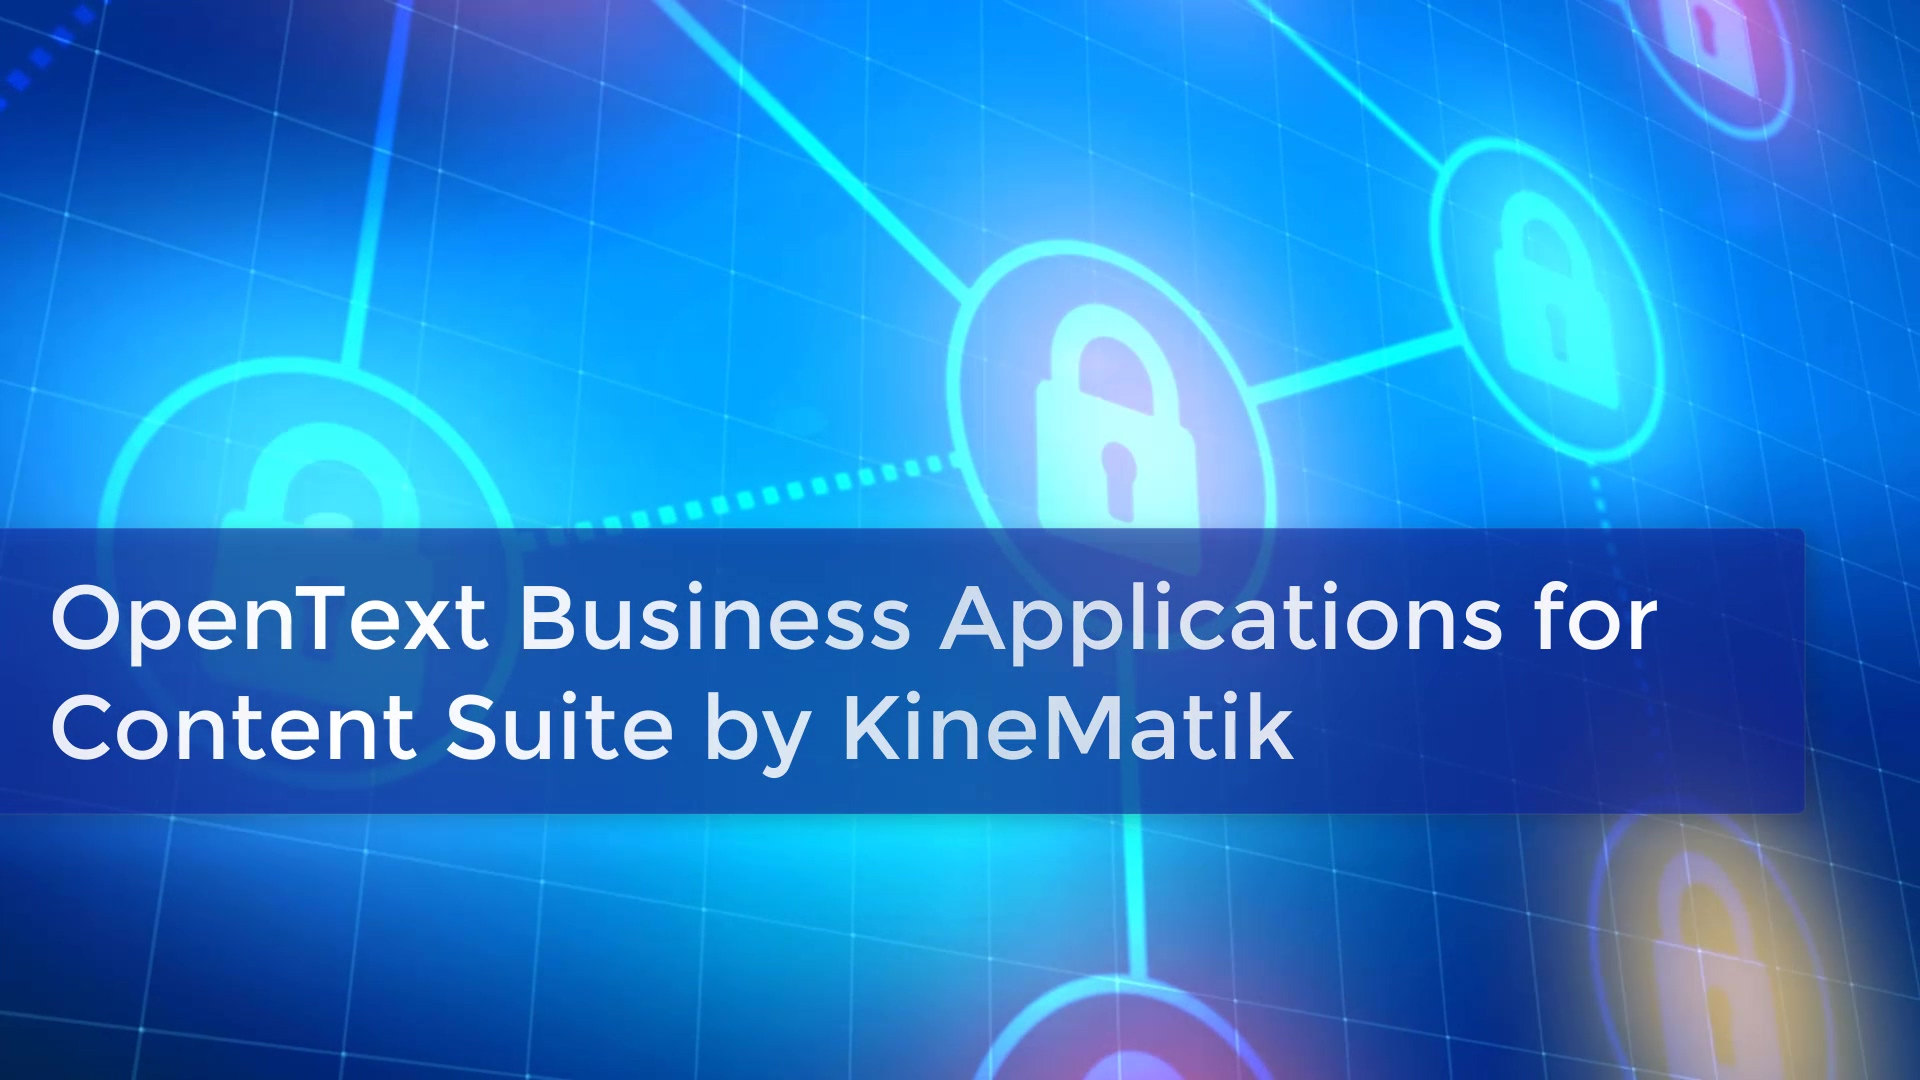 Kinematik social video for business applications